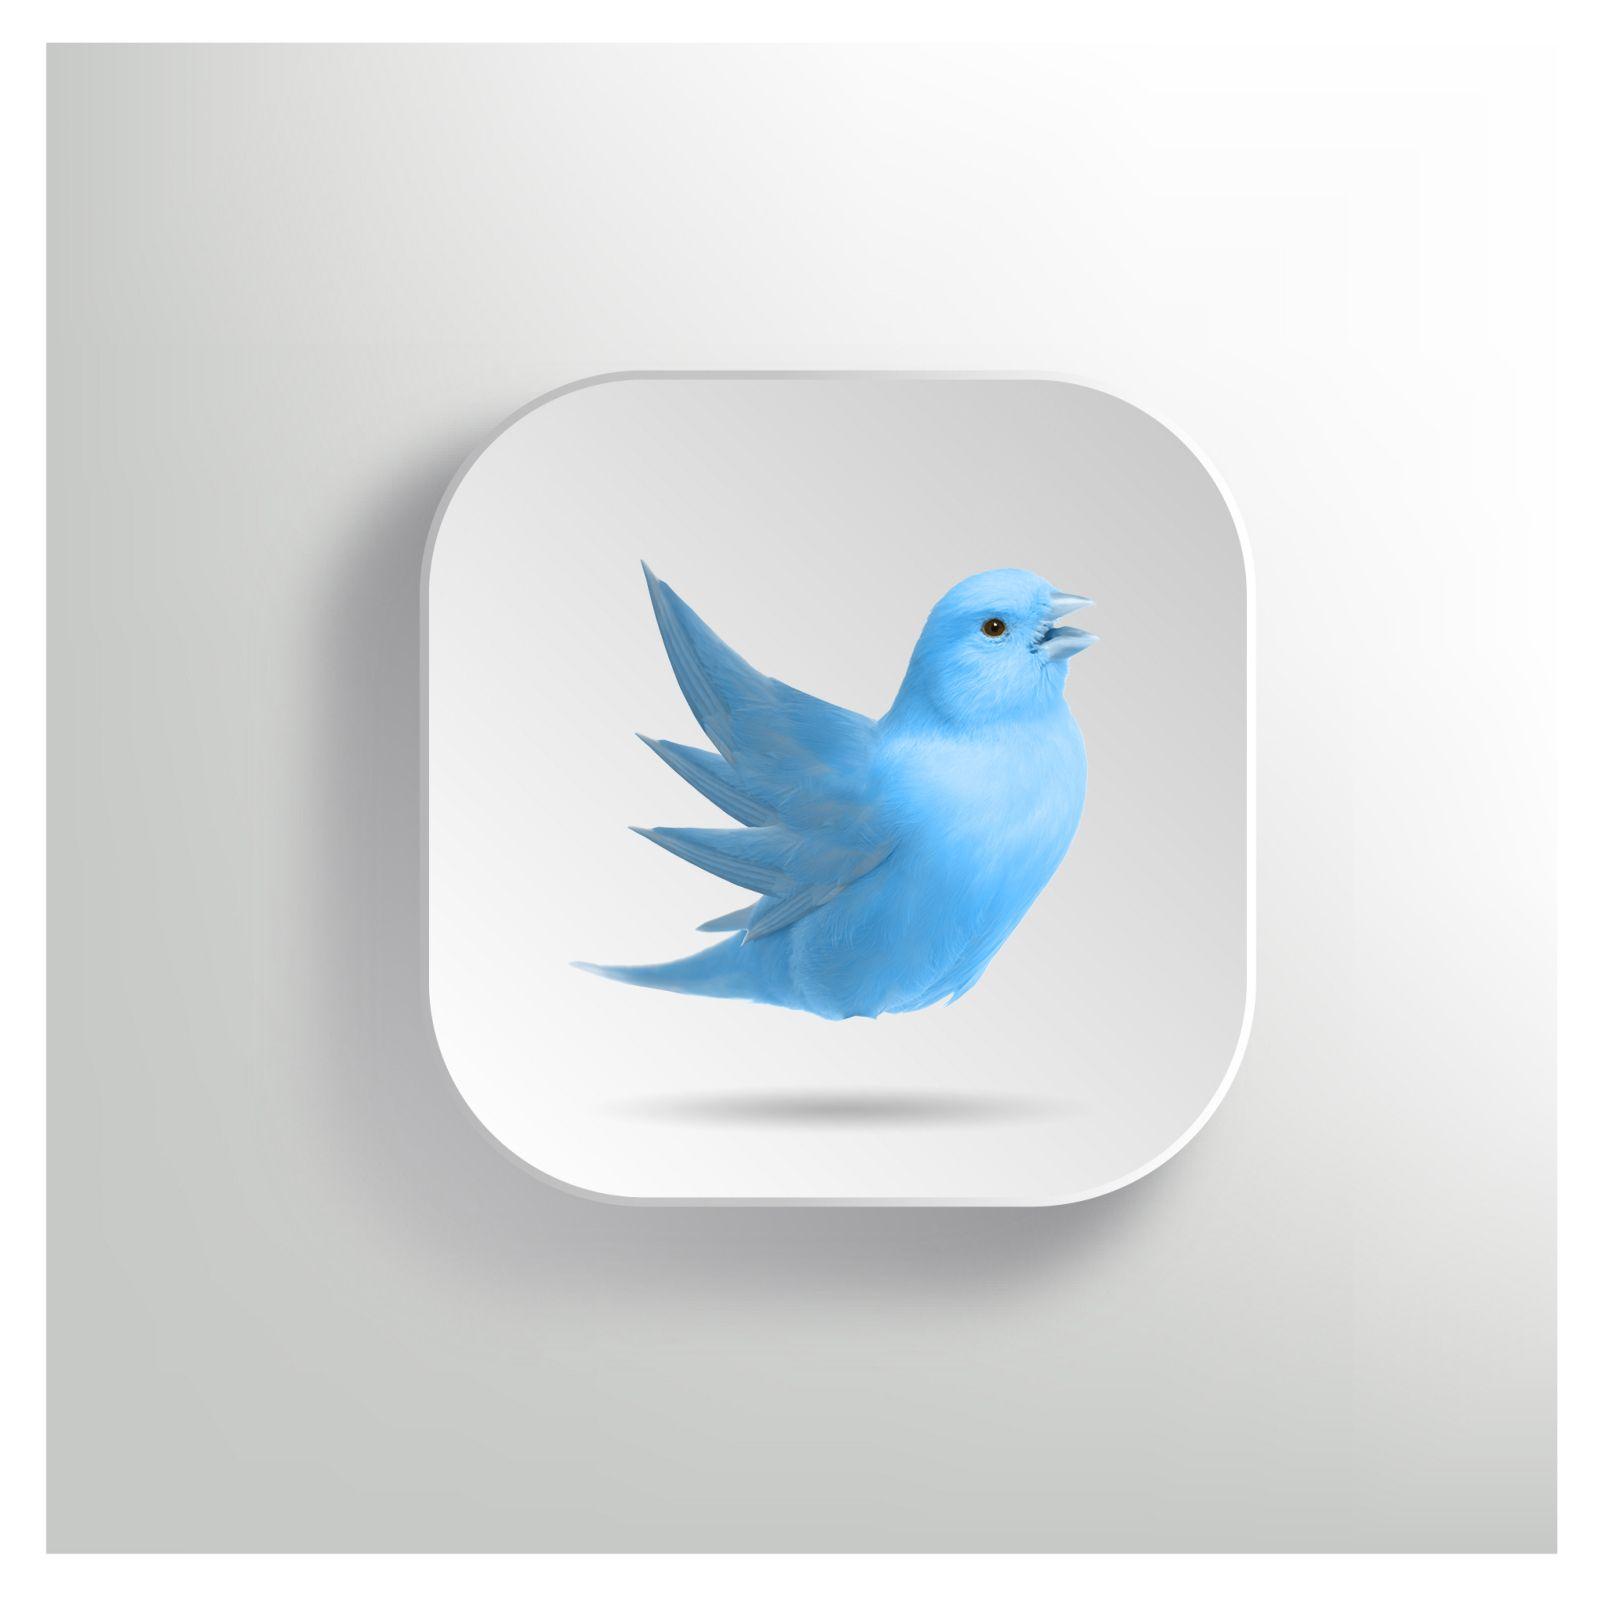 Real life Twitter app icon I designed | App Icon Design